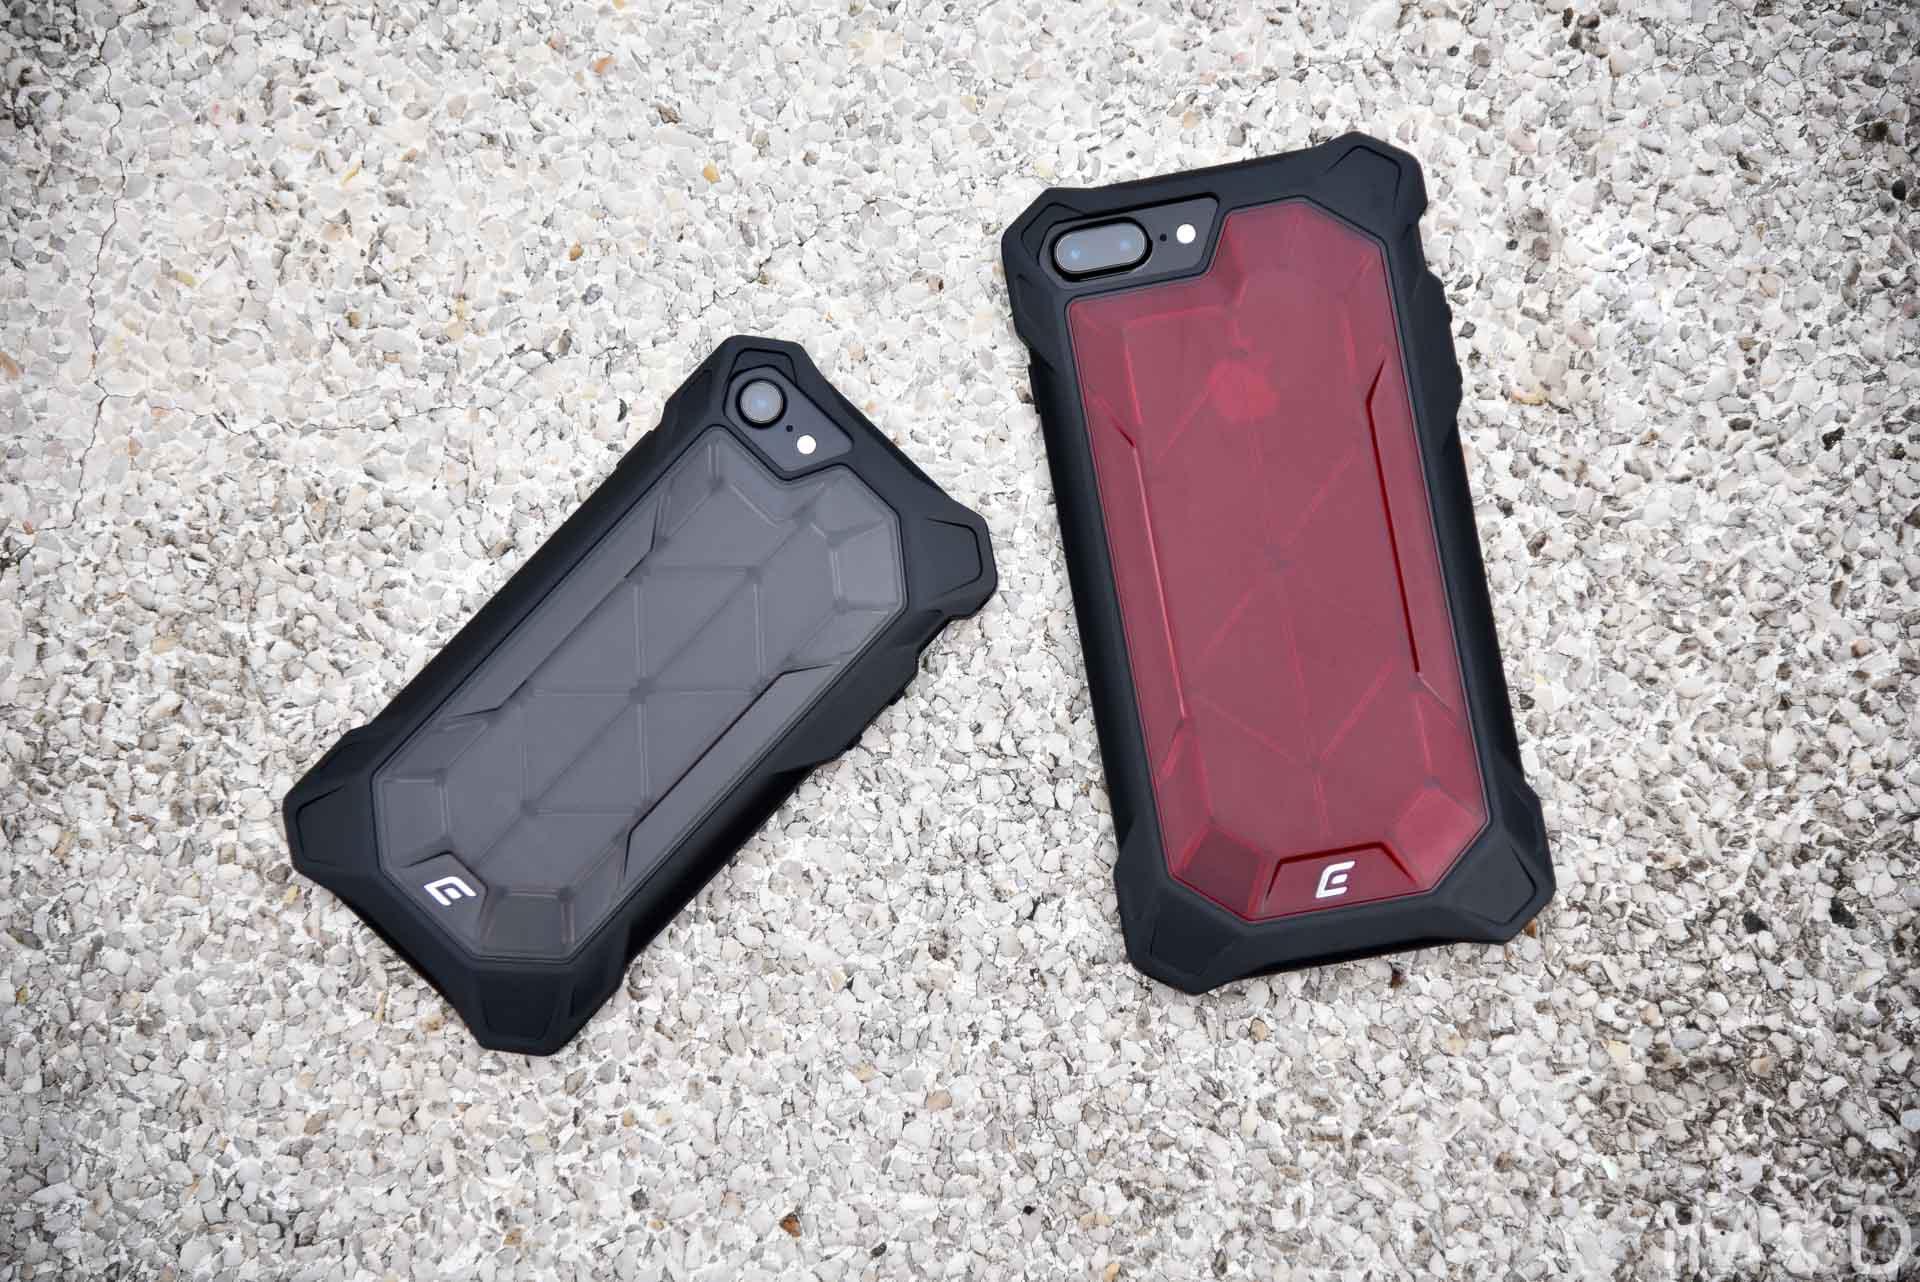 sale retailer 7ed40 12573 รีวิว ELEMENT CASE REV เคสกันกระแทกแบบสุดขีดเพื่อ iPhone 7, 7 Plus